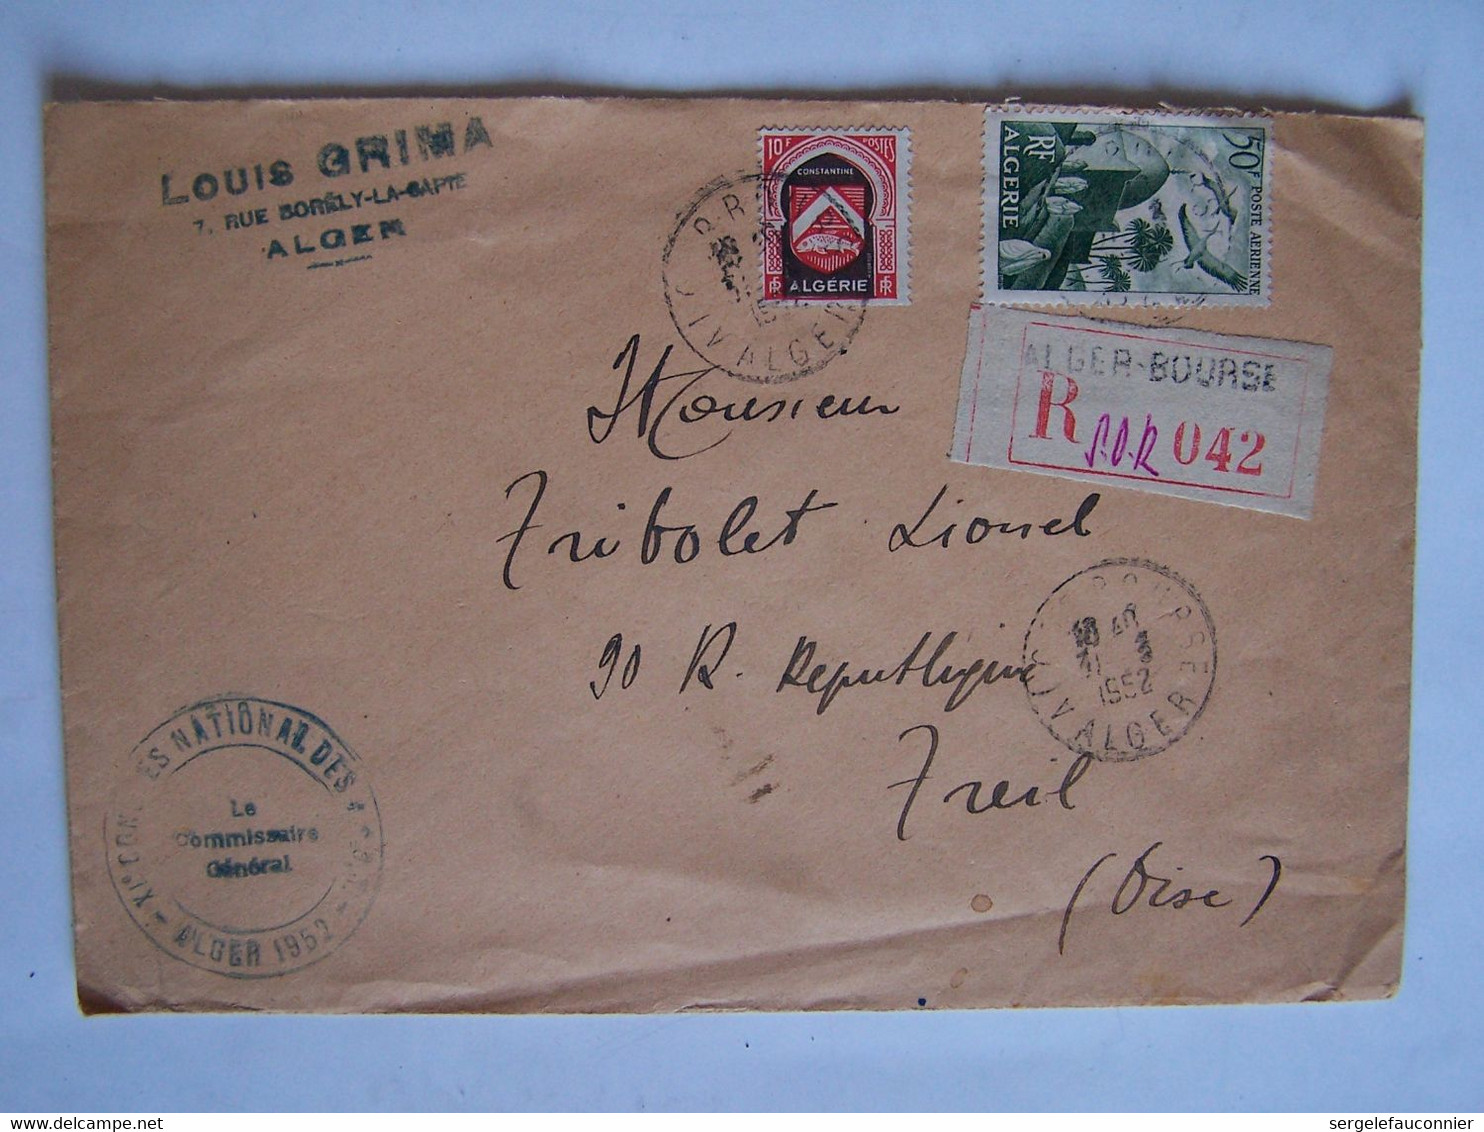 ALGERIE 31-3-1952 ALGER Vers CREIL LETTRE RECOMMANDEE - Usati